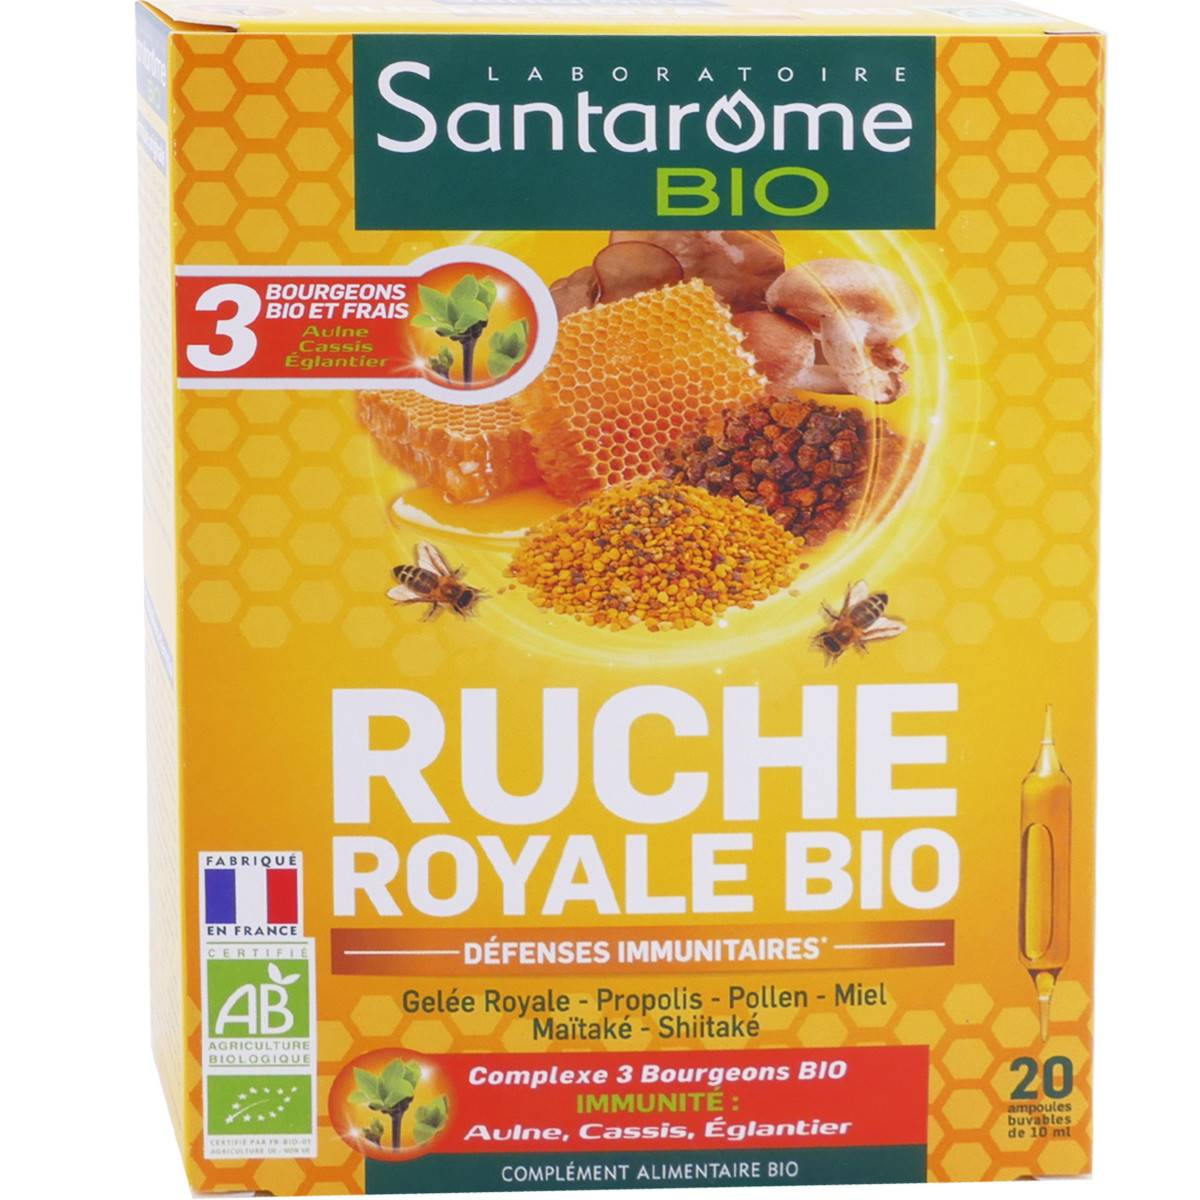 SANTAROME BIO Santarome ruche royal bio 20 ampoules 10 ml